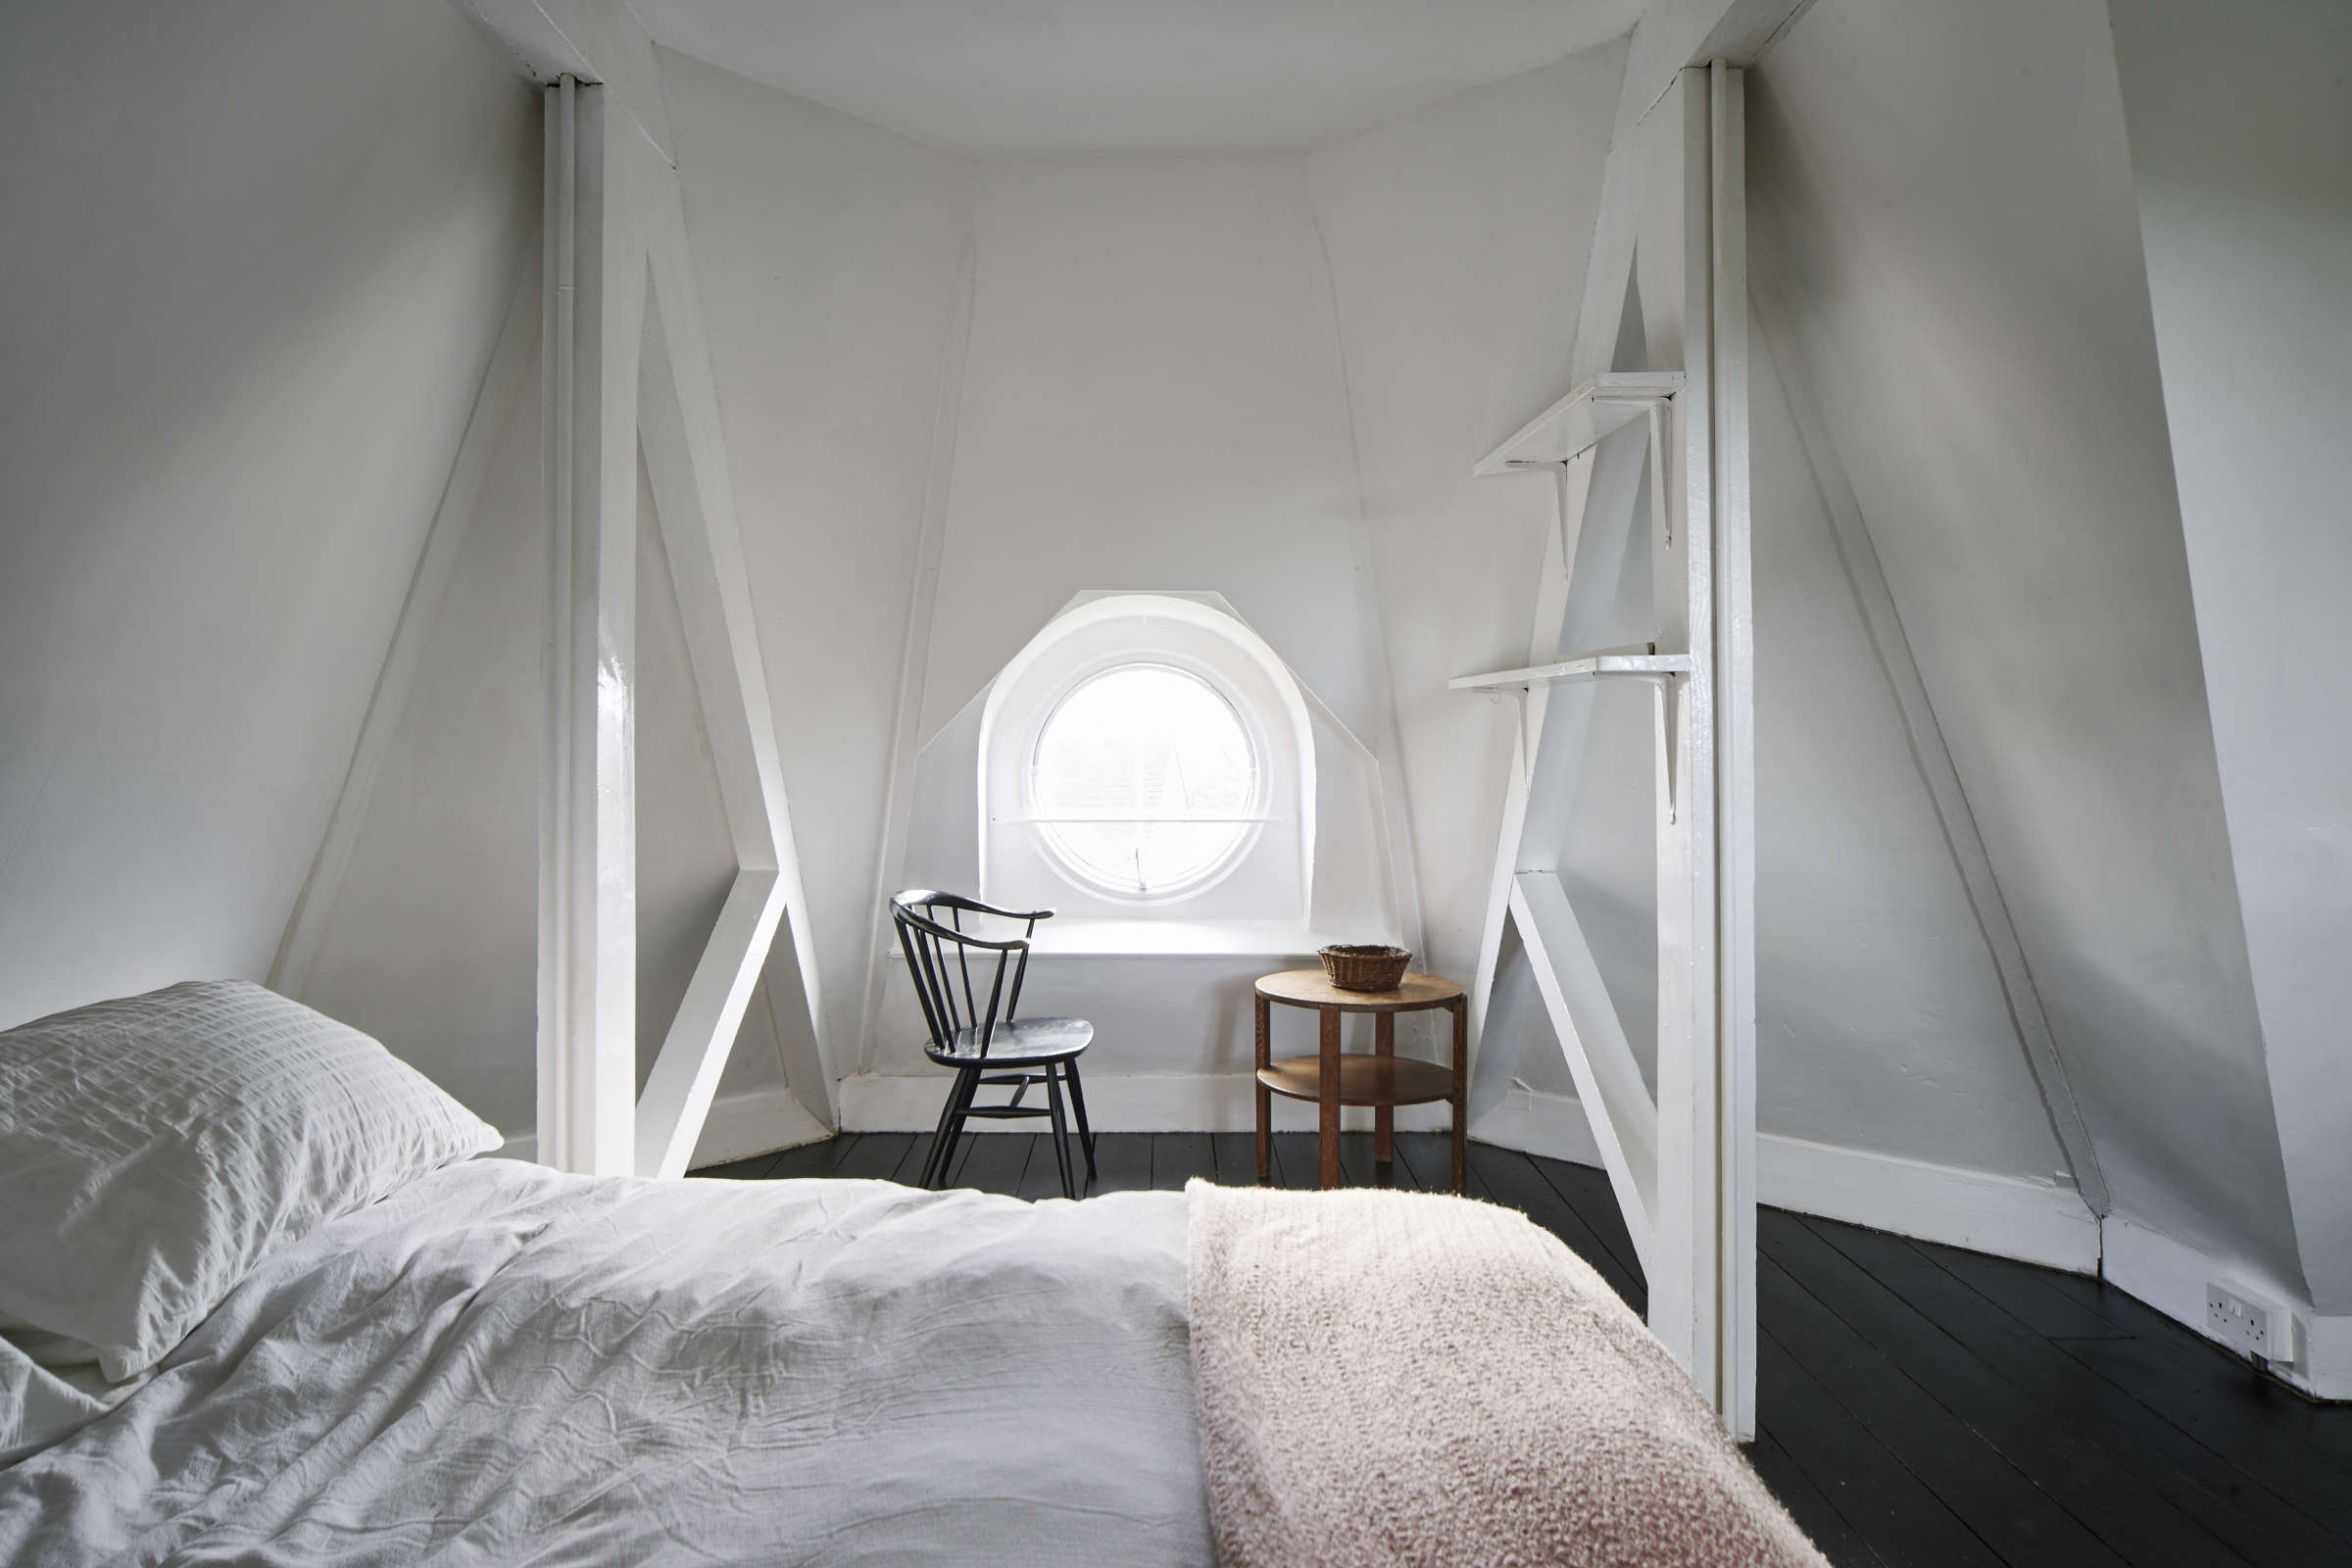 Above a circular oeil de boeuf window in the top floor bedroom